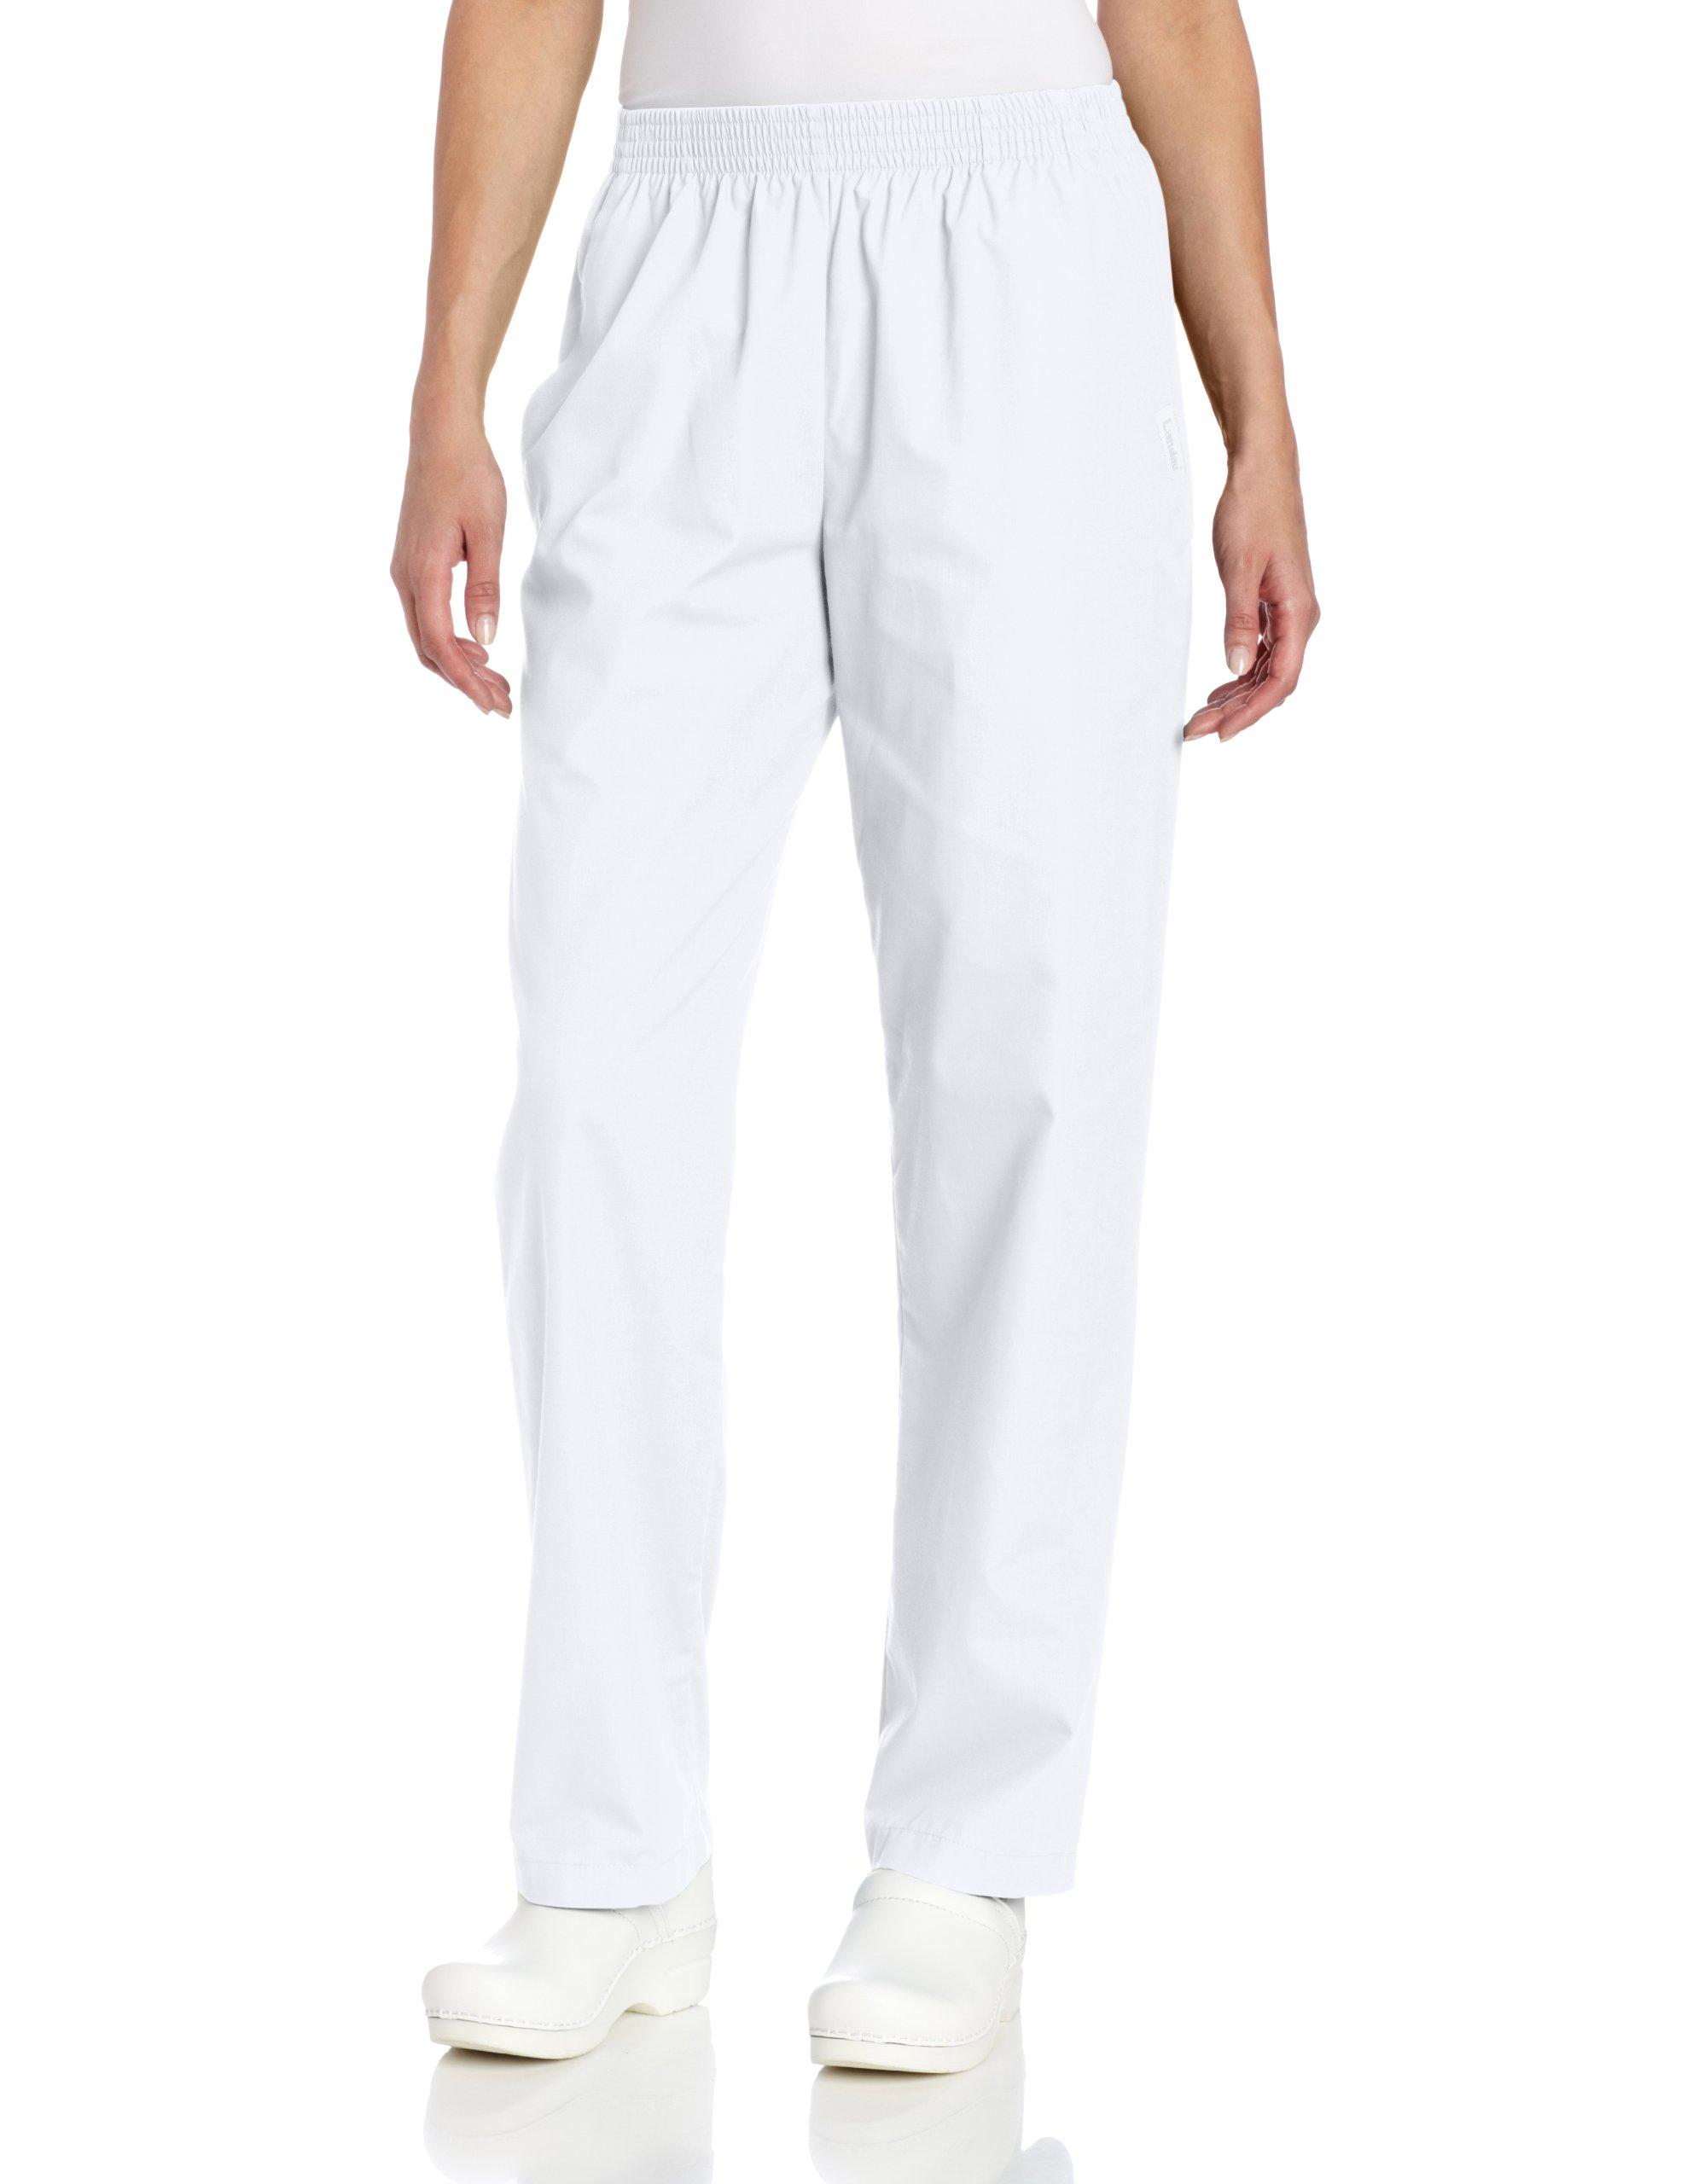 Landau Women's Classic Relaxed Scrub Pant, White, Large